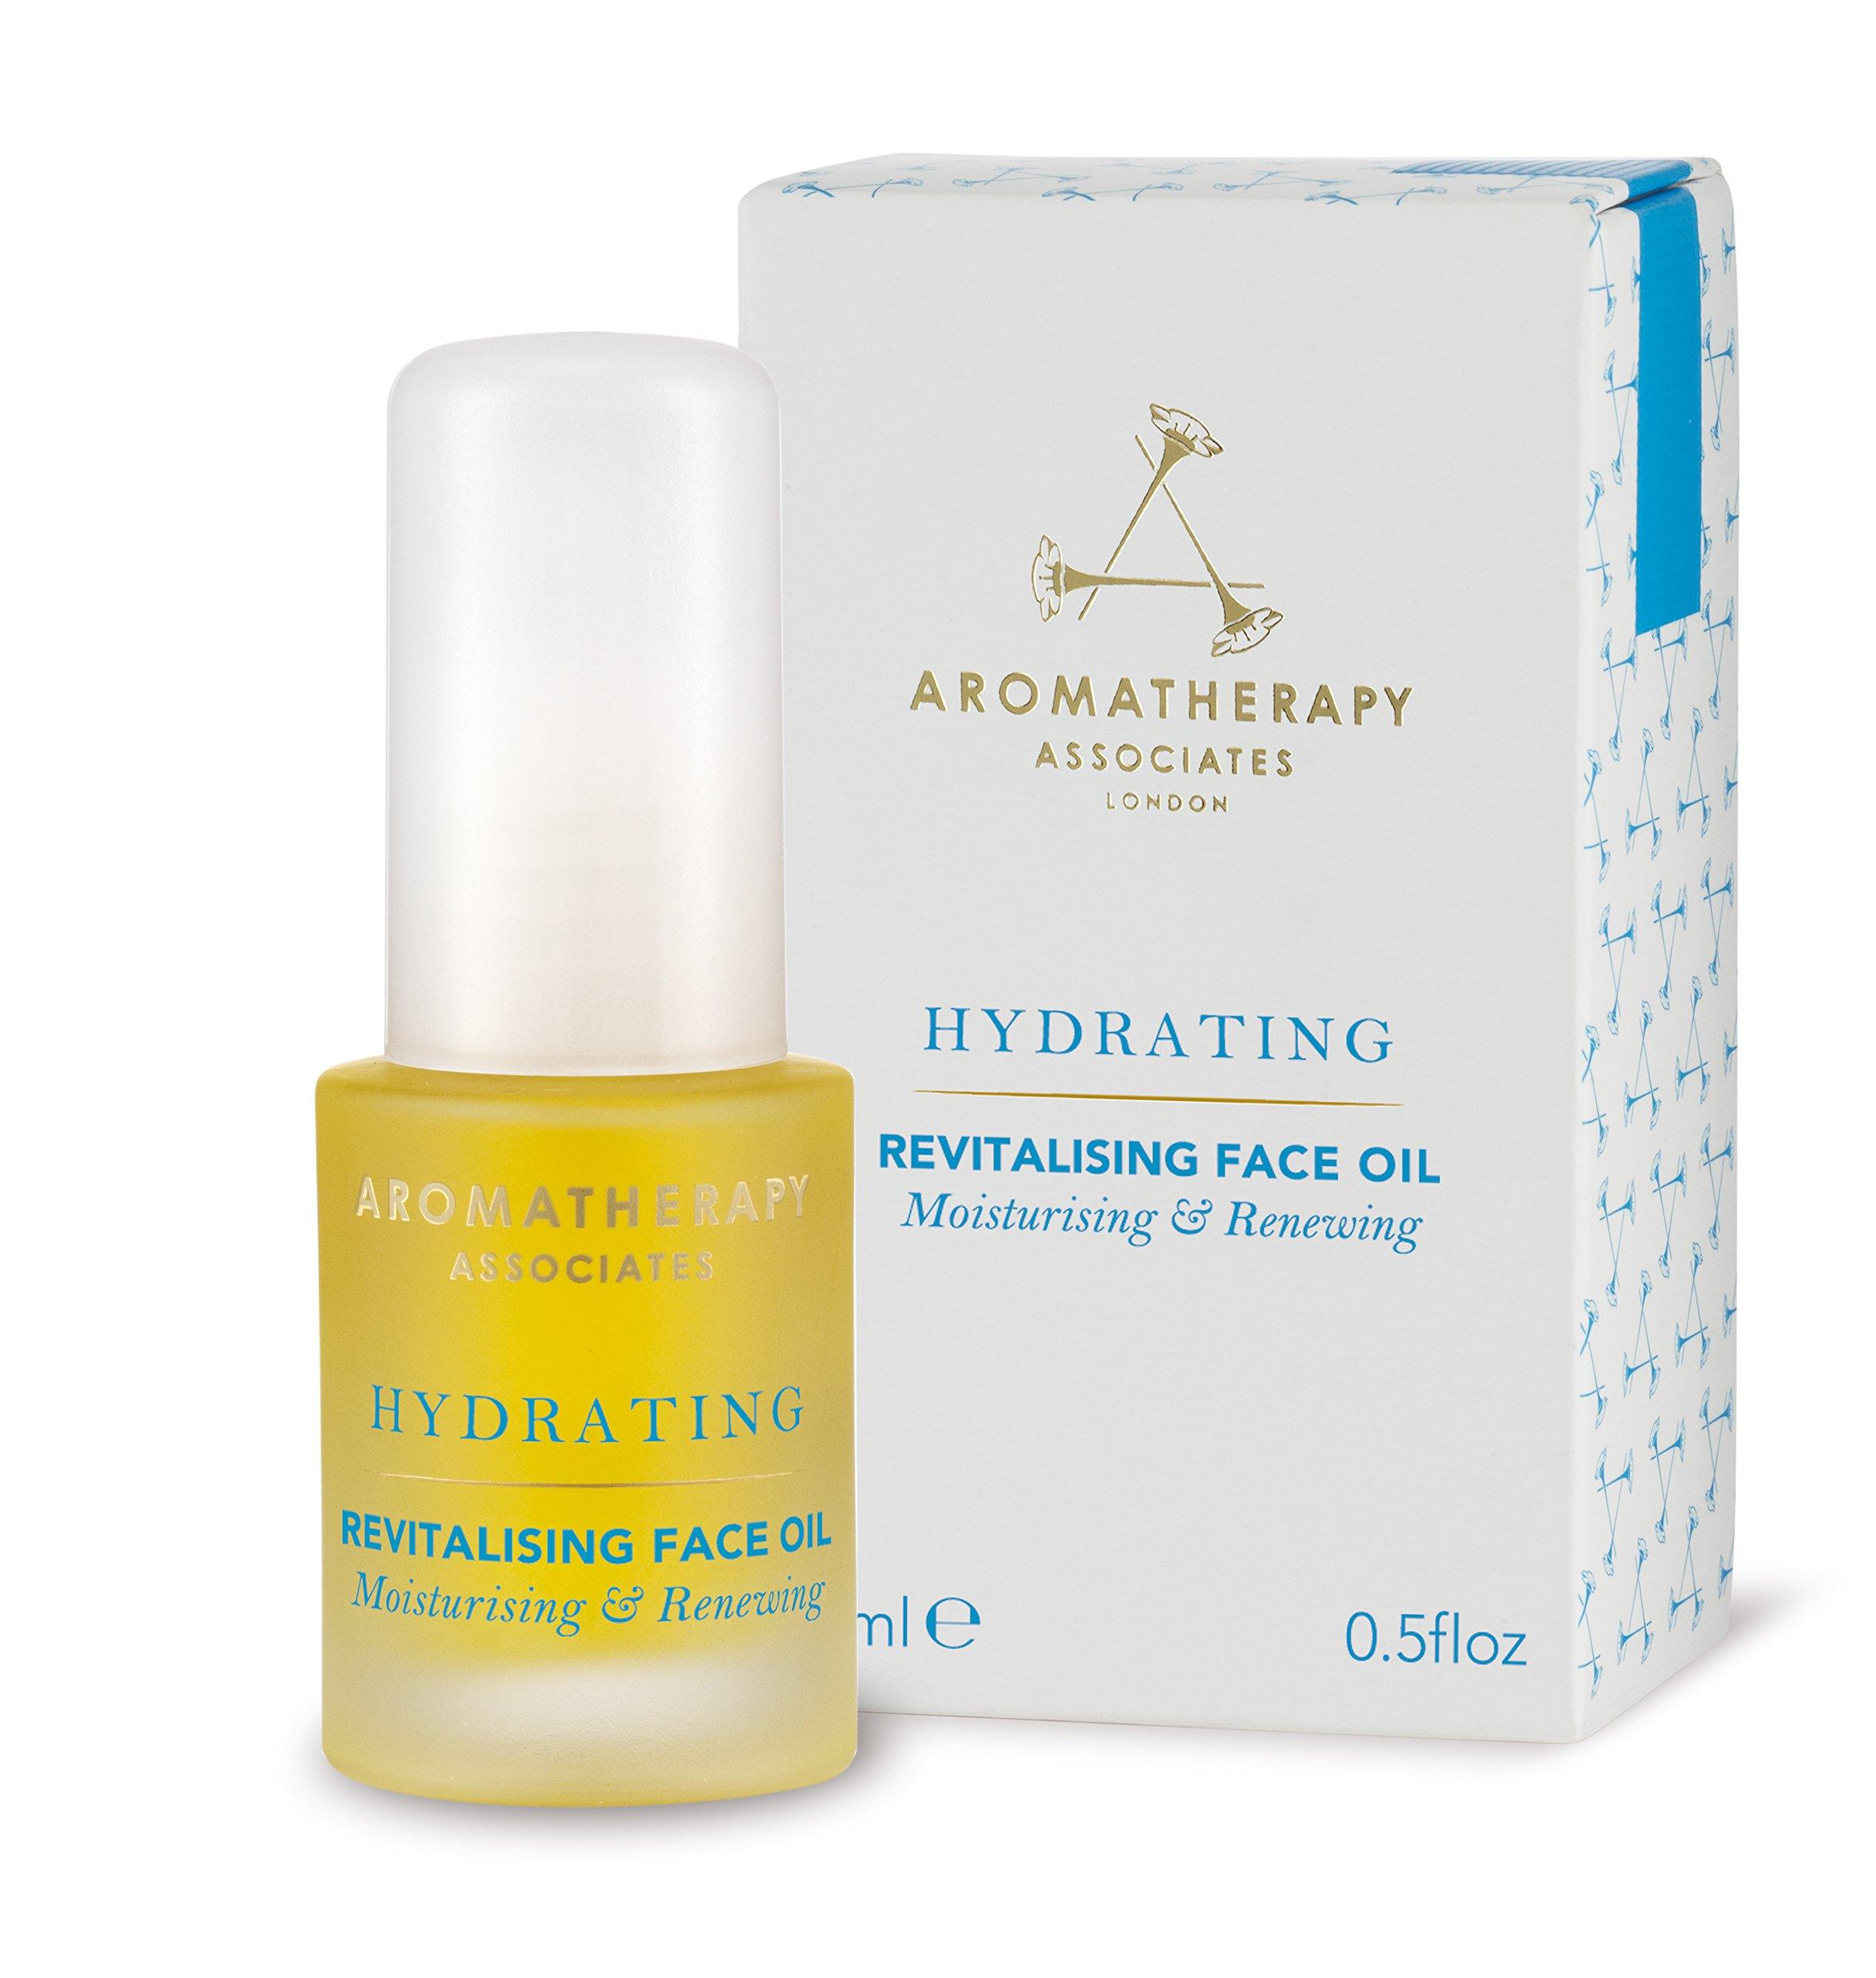 Aromatherapy Associates Hydrating Revitalizing Face Oil, 0.5 fl. oz.